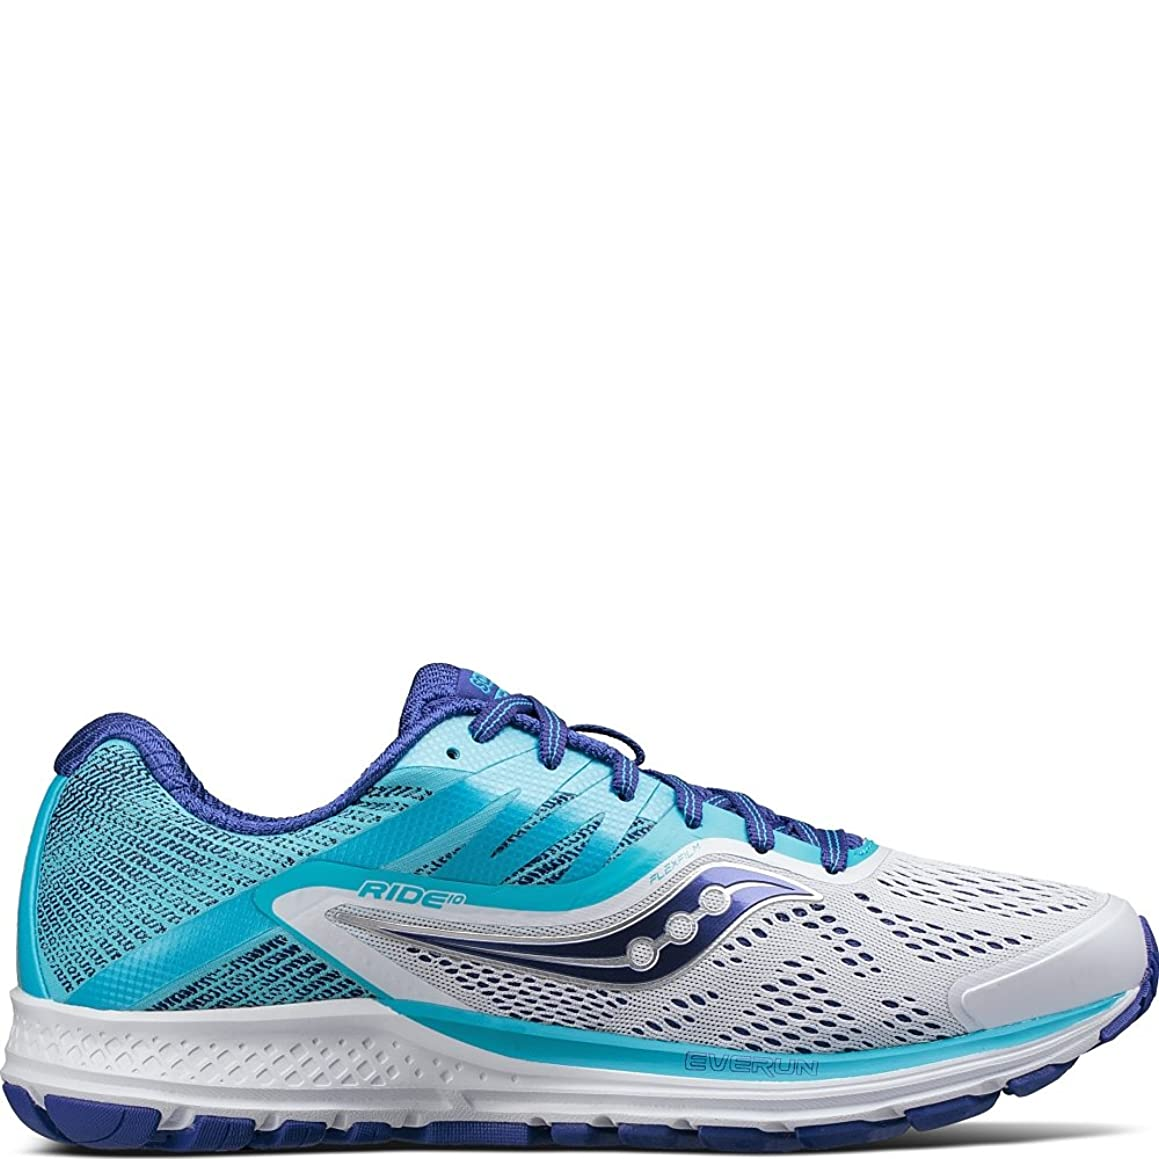 Saucony Women's Ride 10 Running-Shoes